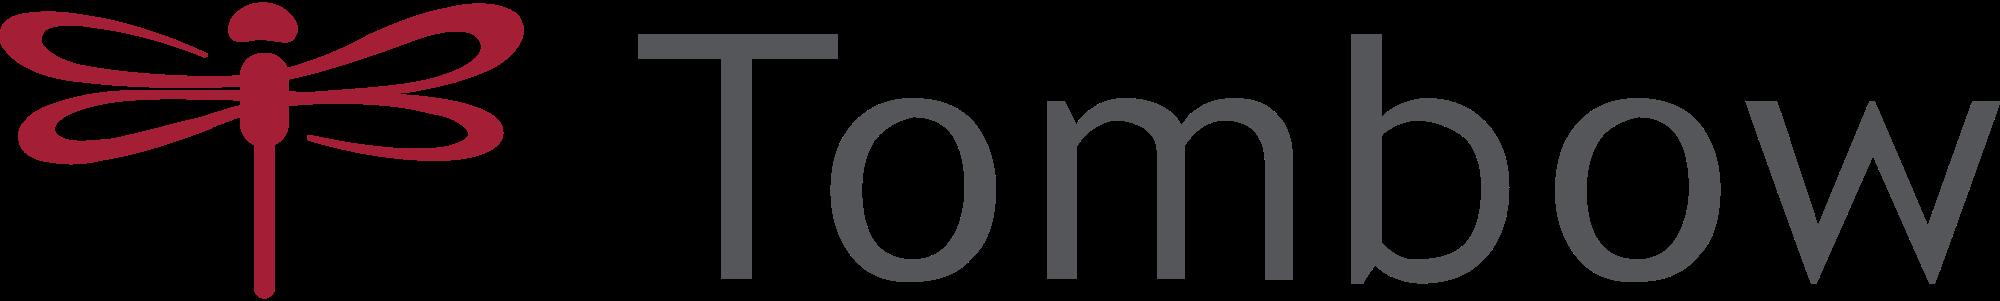 CSM Spotlight on Tombow / Dual Brush Pens